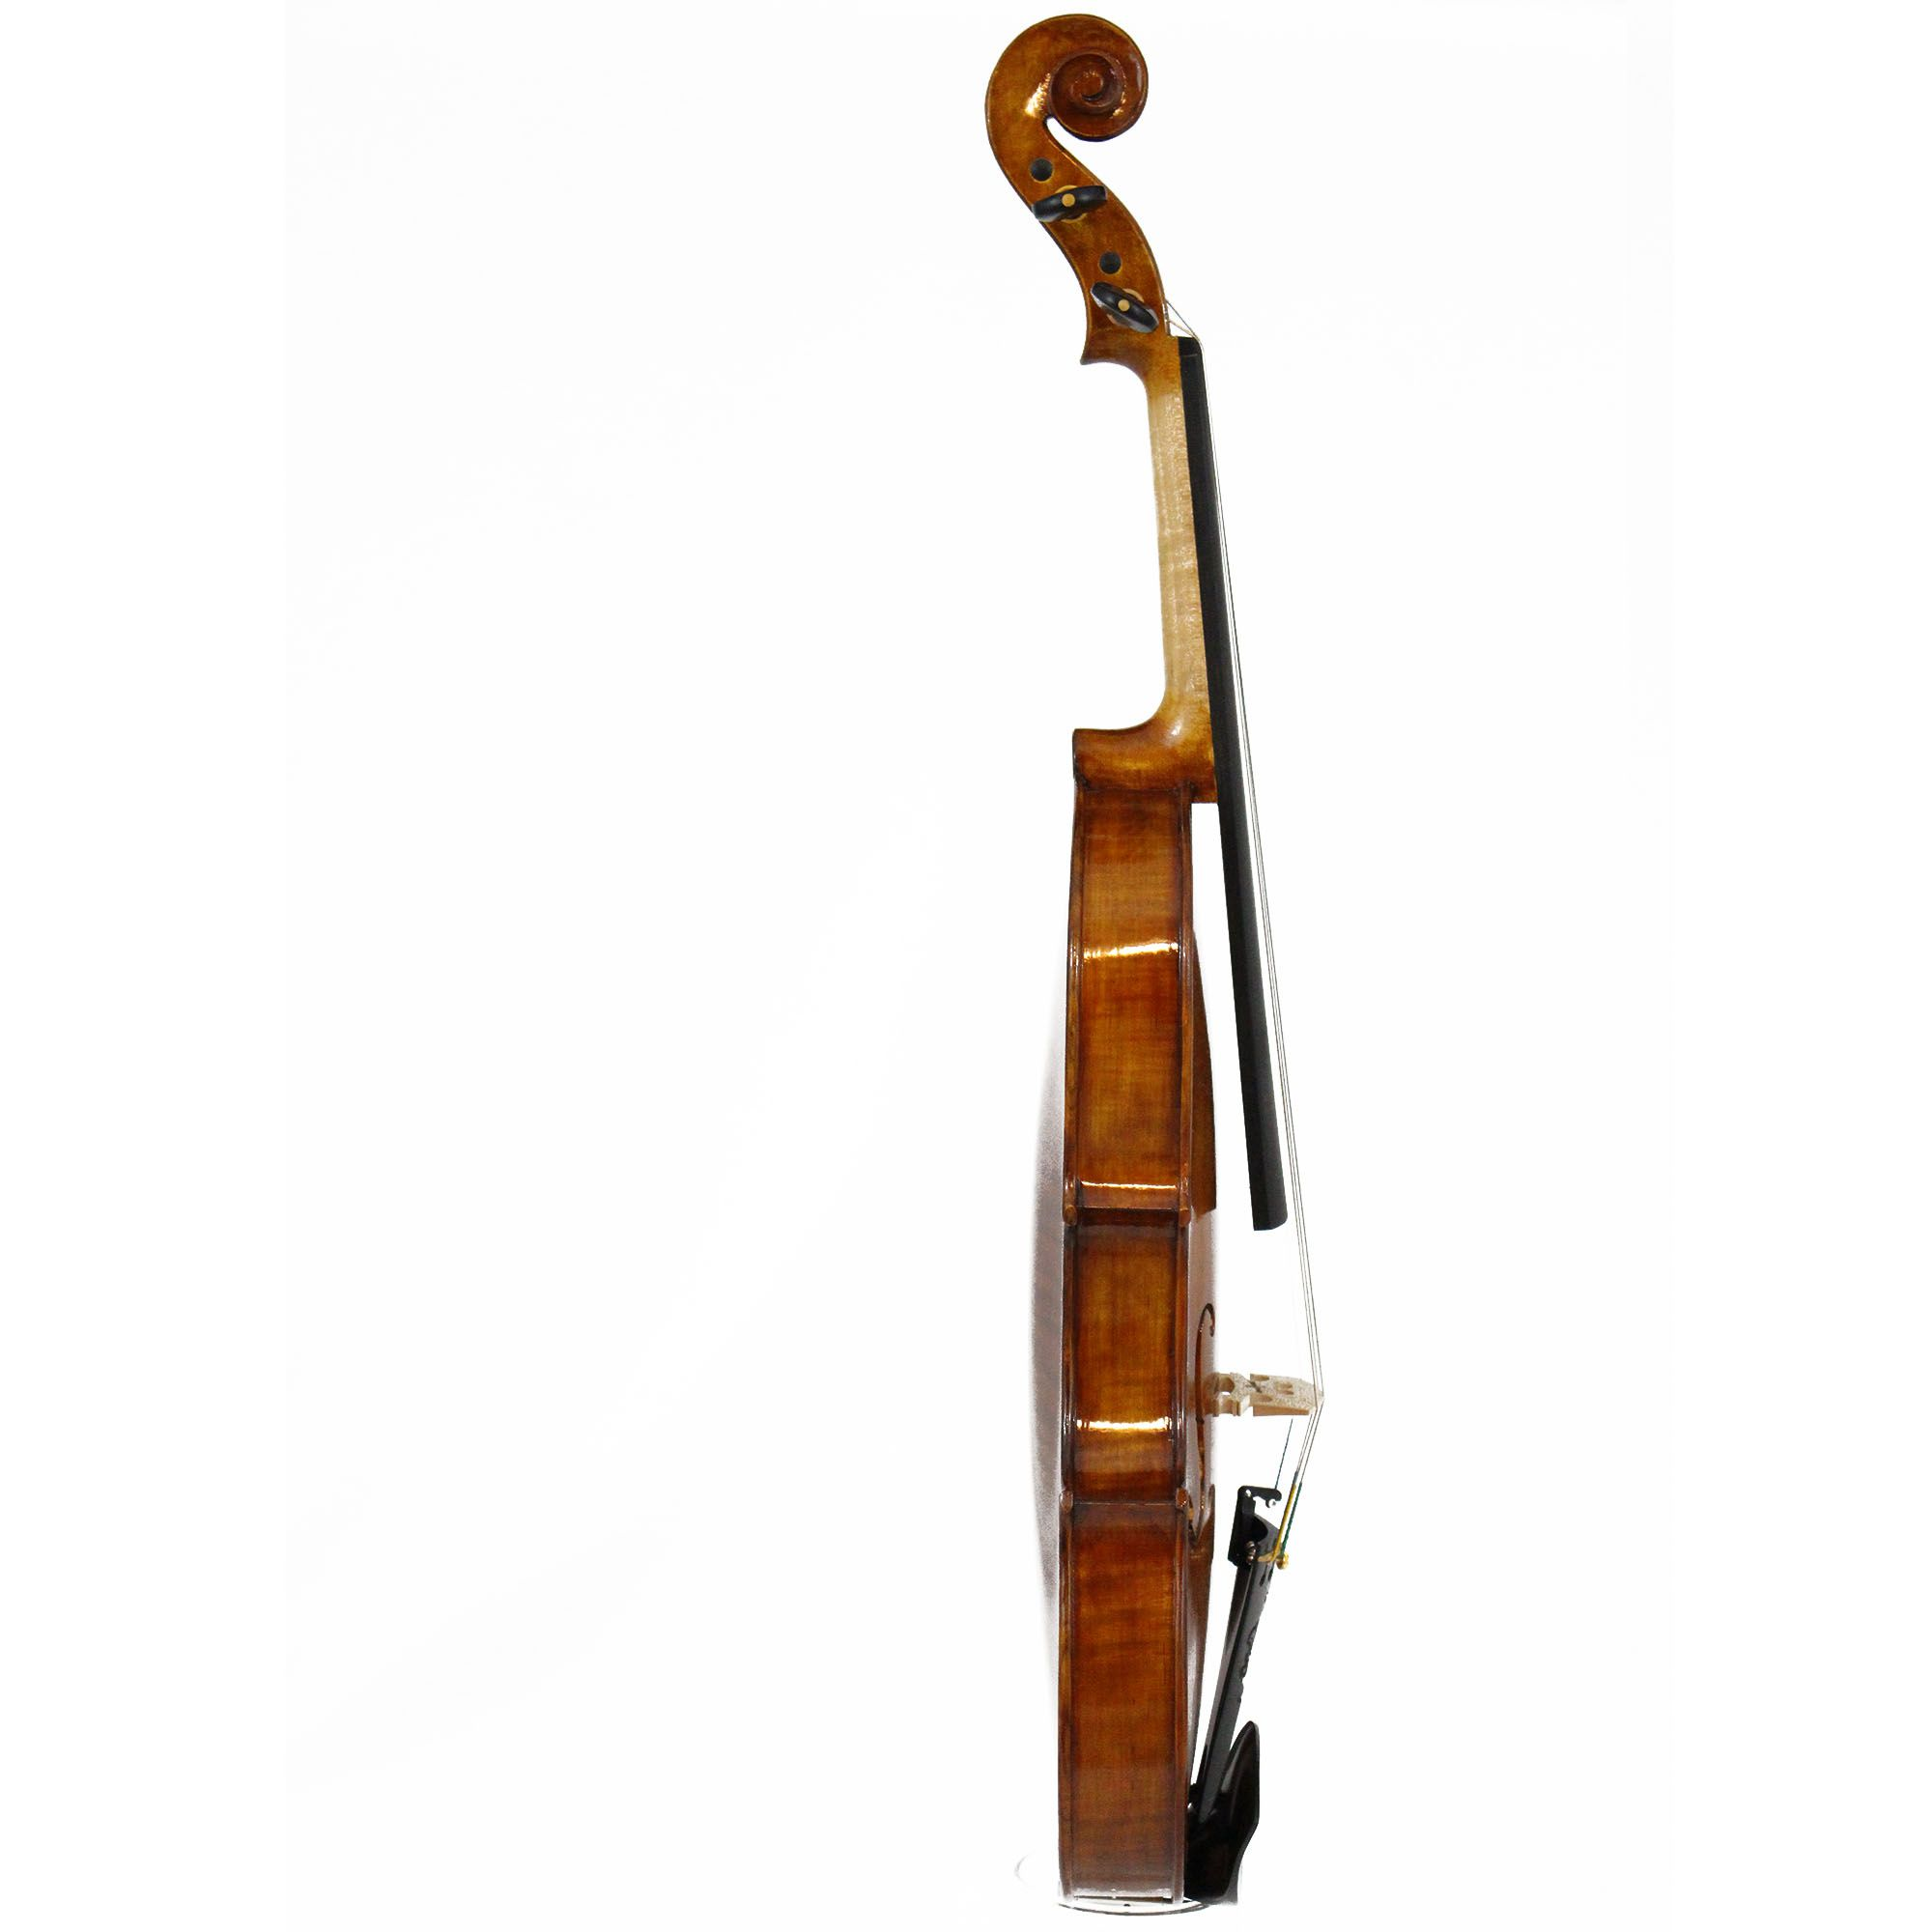 Violino feito à mão modelo strad 4/4 verniz goma laca